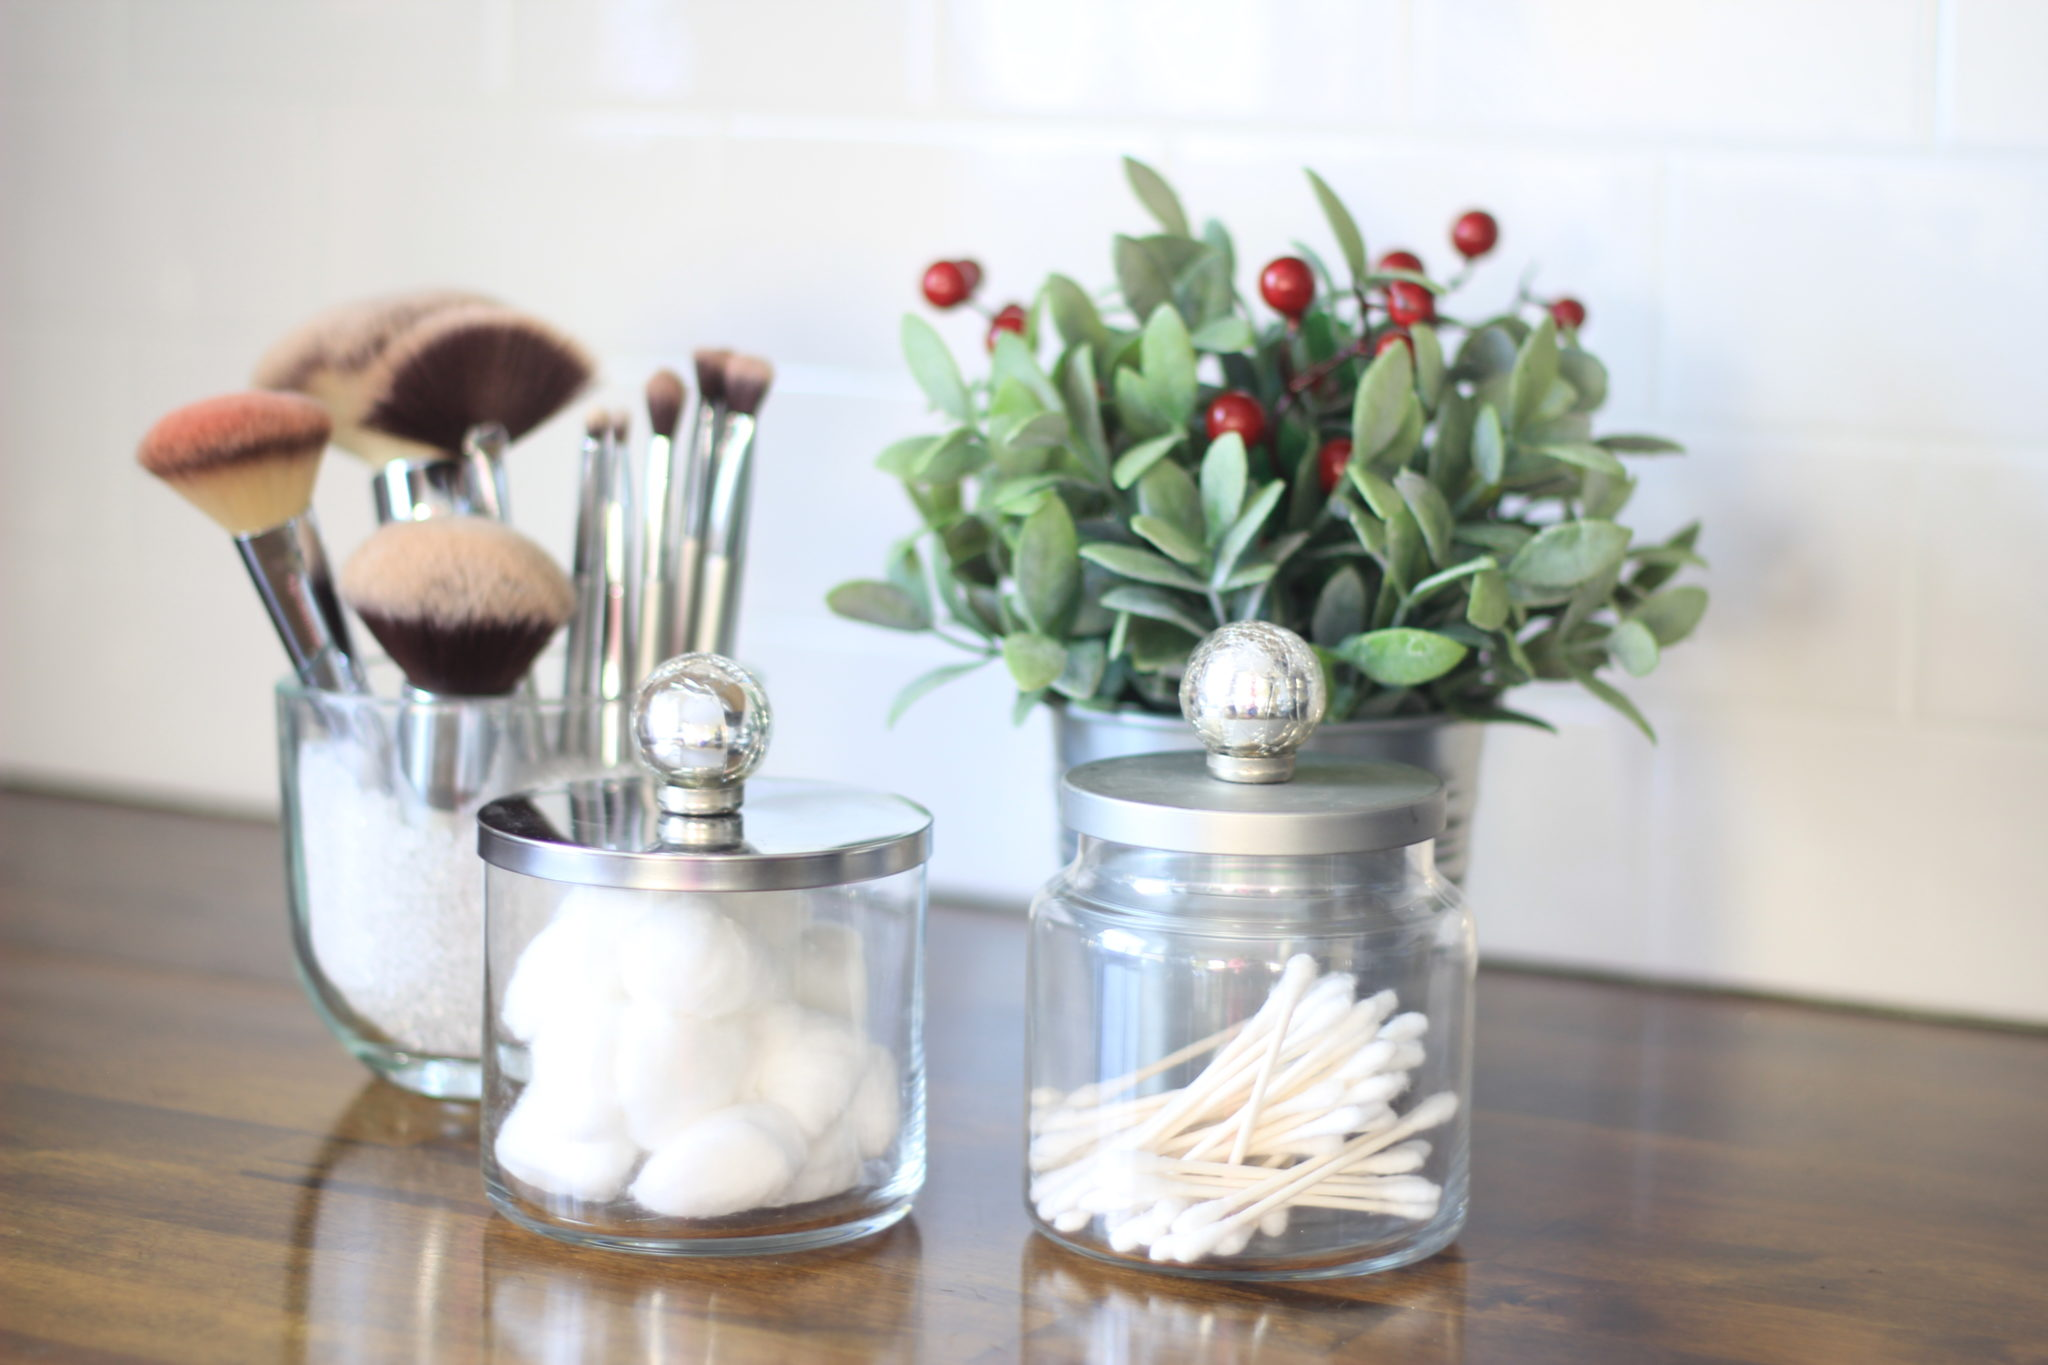 Diy bathroom organization - 12 Days Of Craftmas 12 Handmade Christmas Gifts That You Can Easily Make And Give